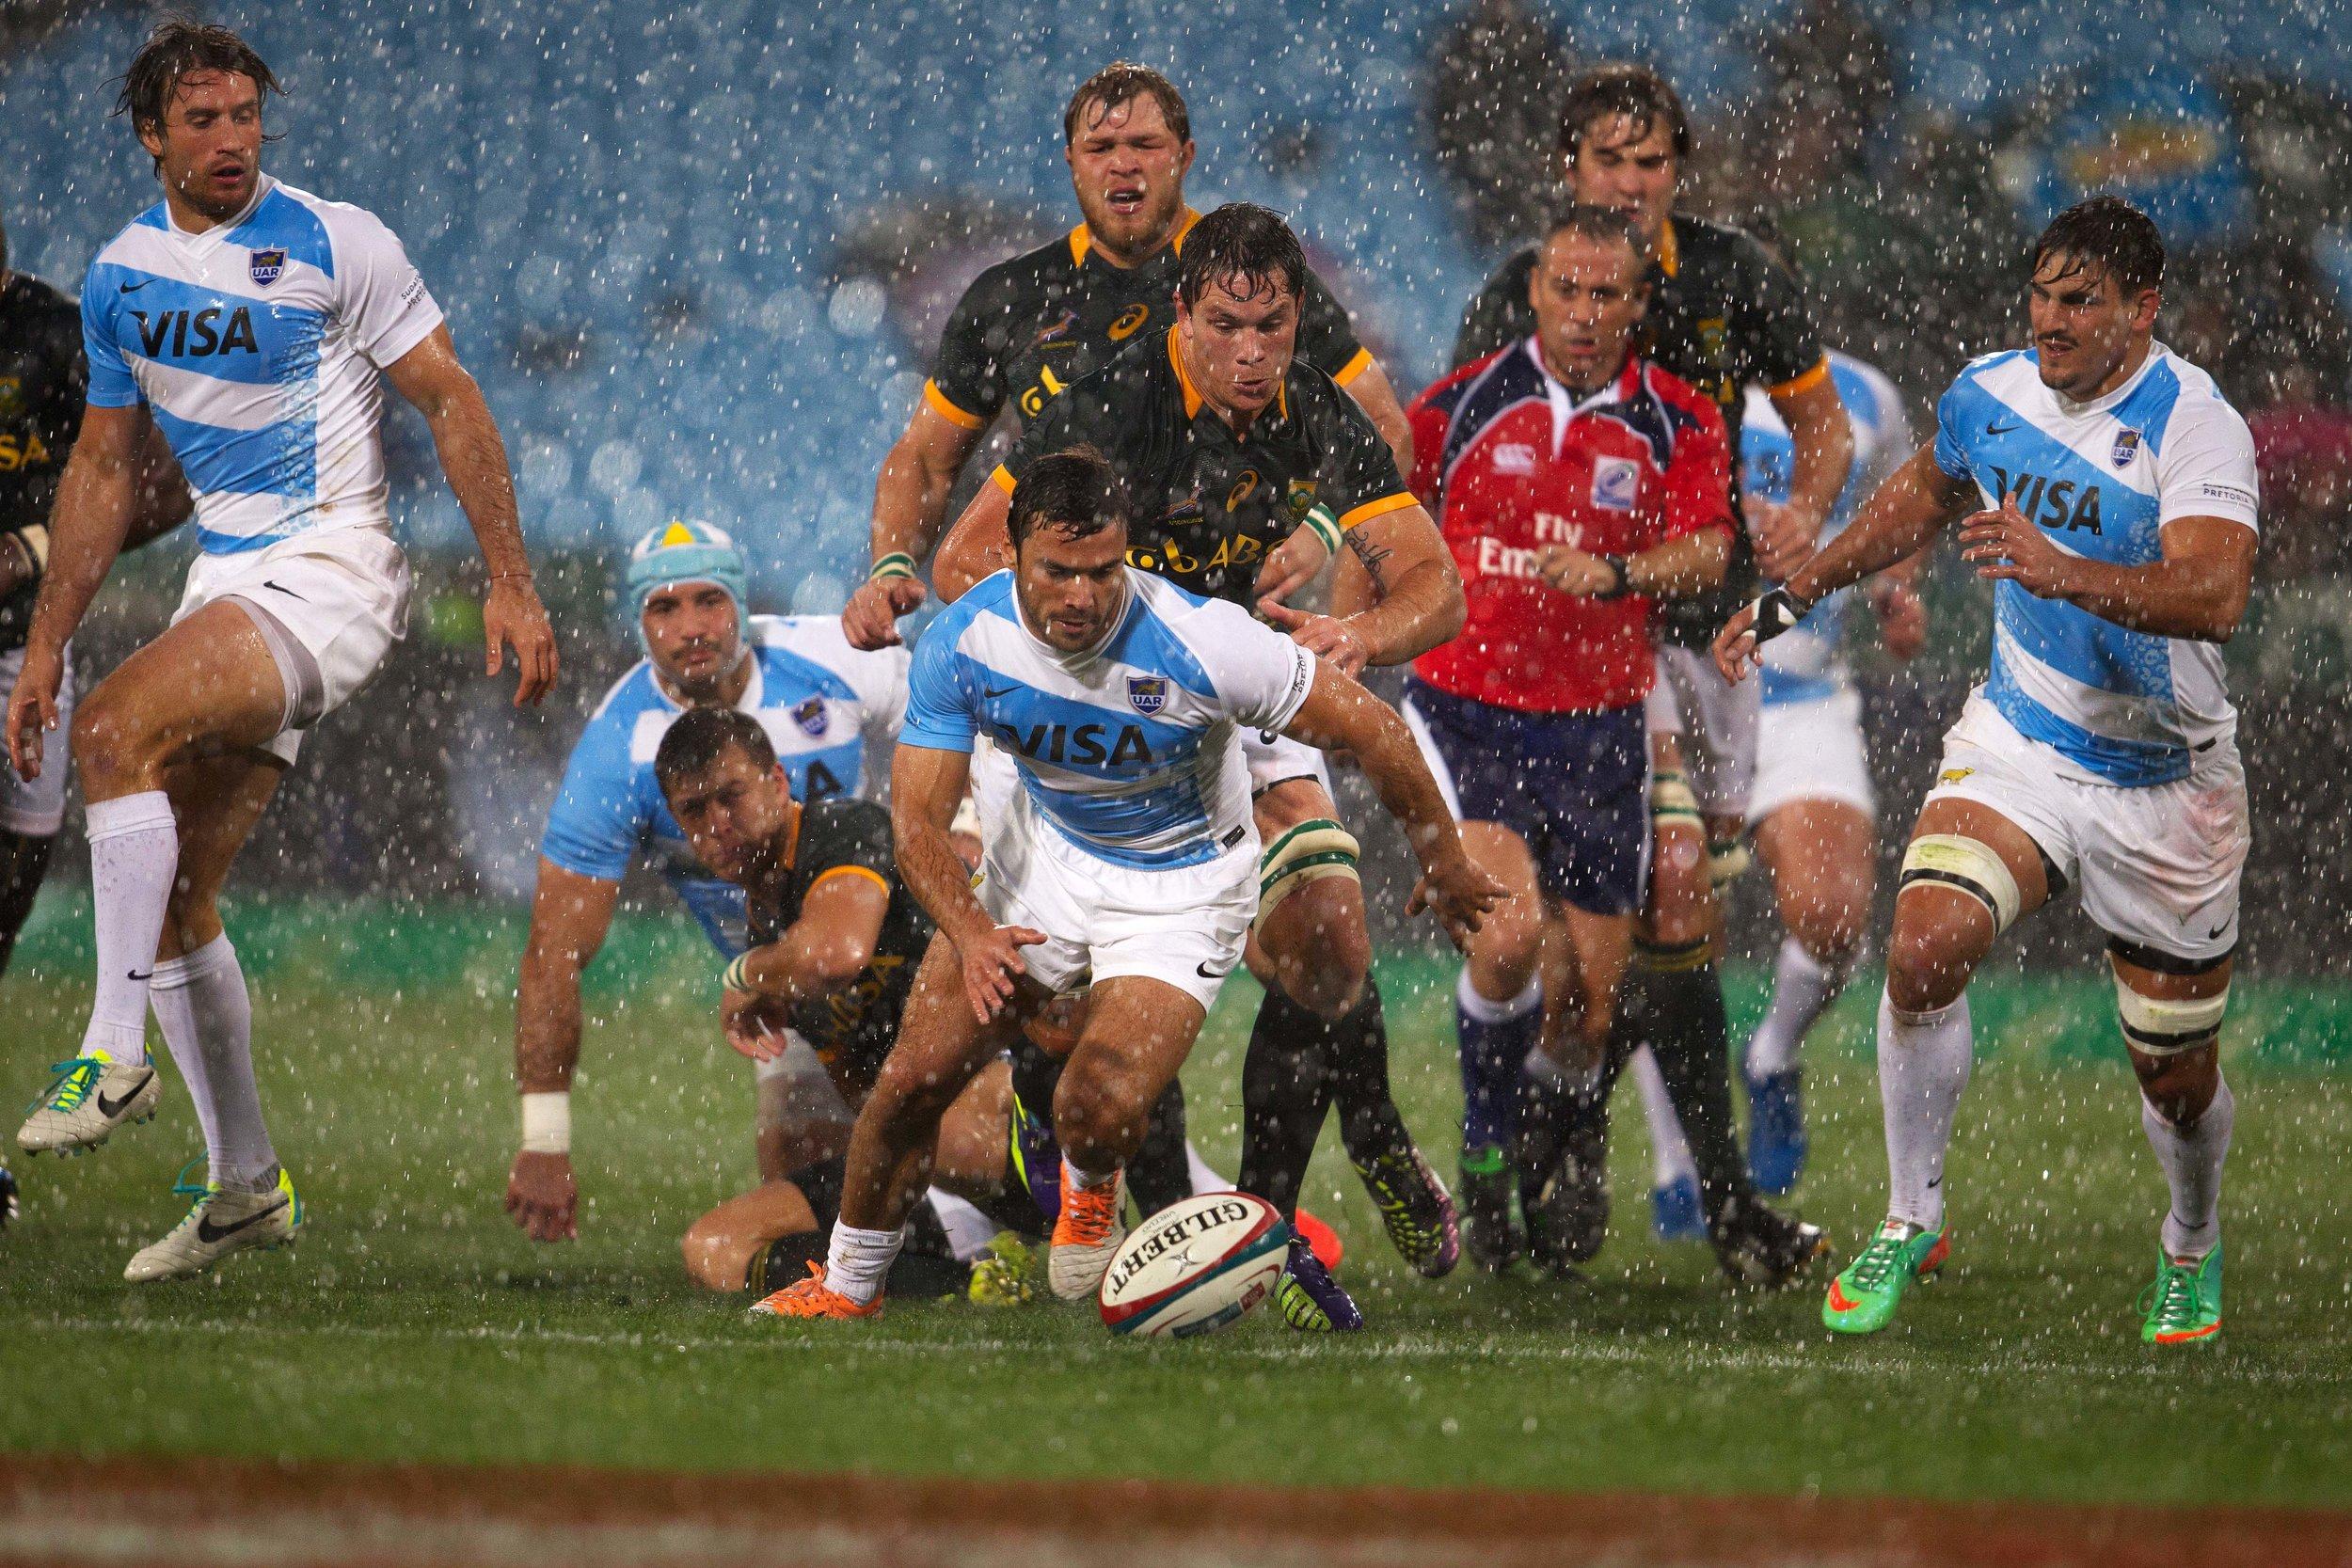 Rugby05a.jpg